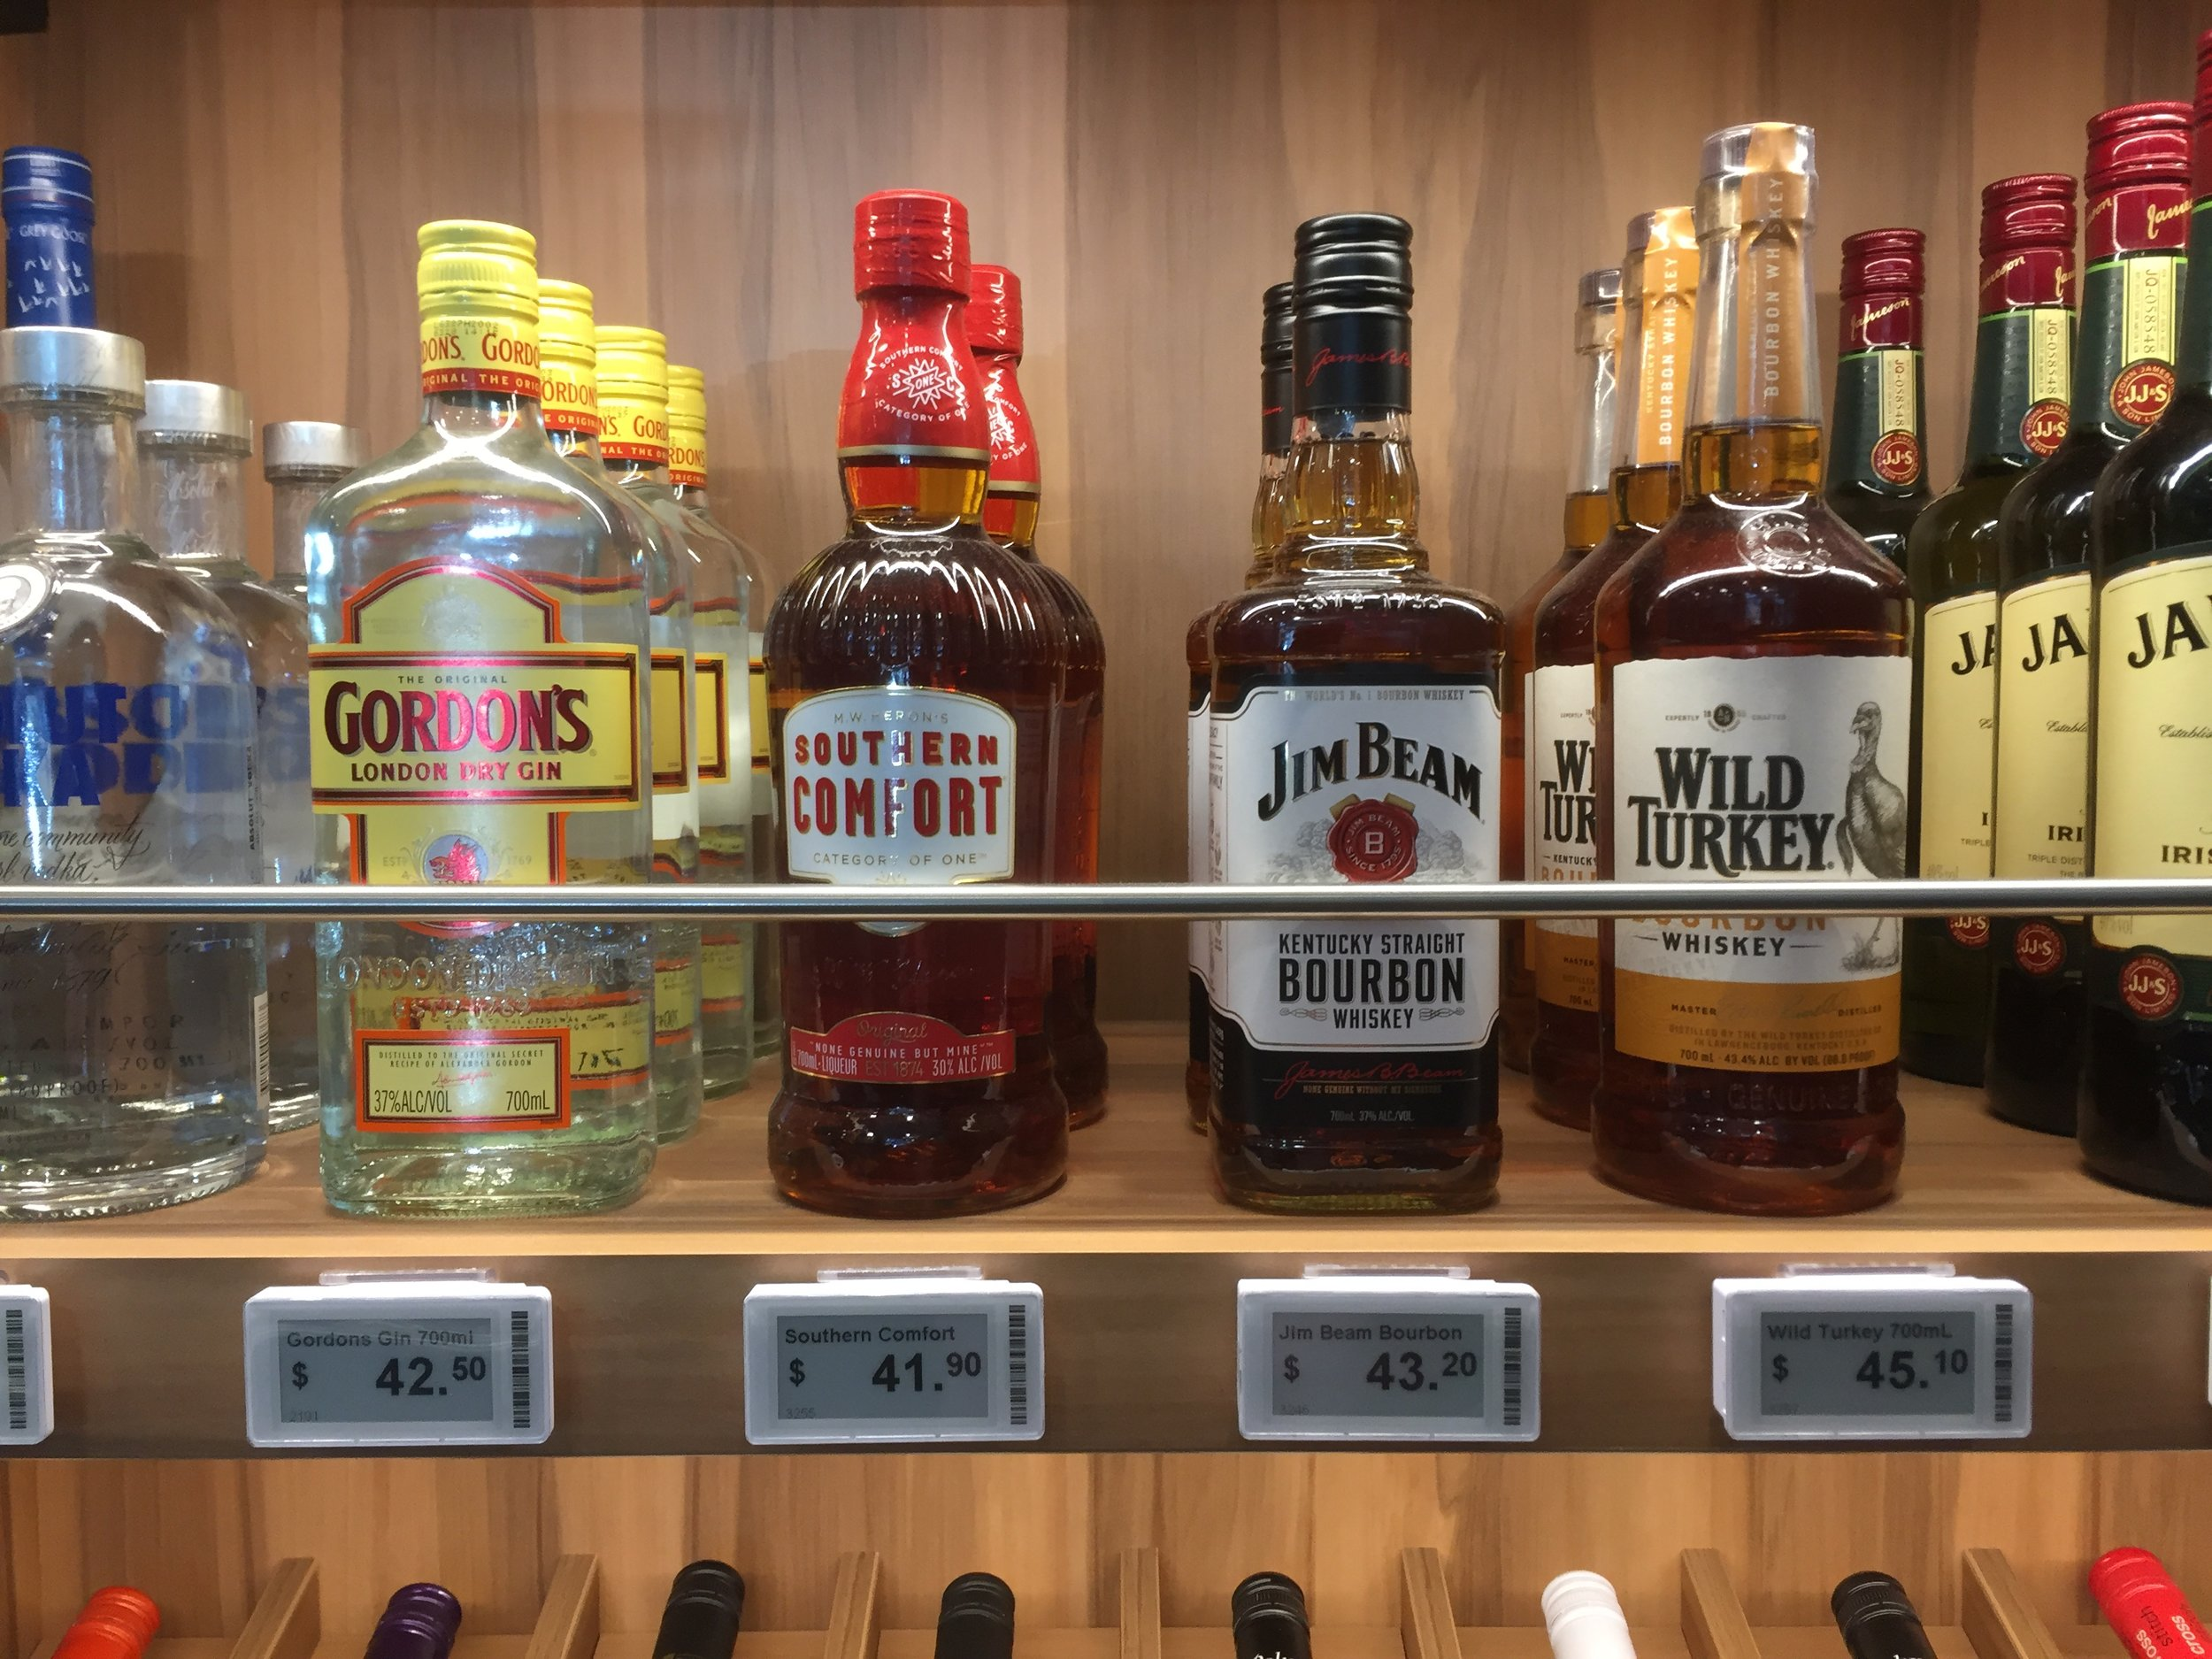 Sydney bottle shop liquor display with digital price tags